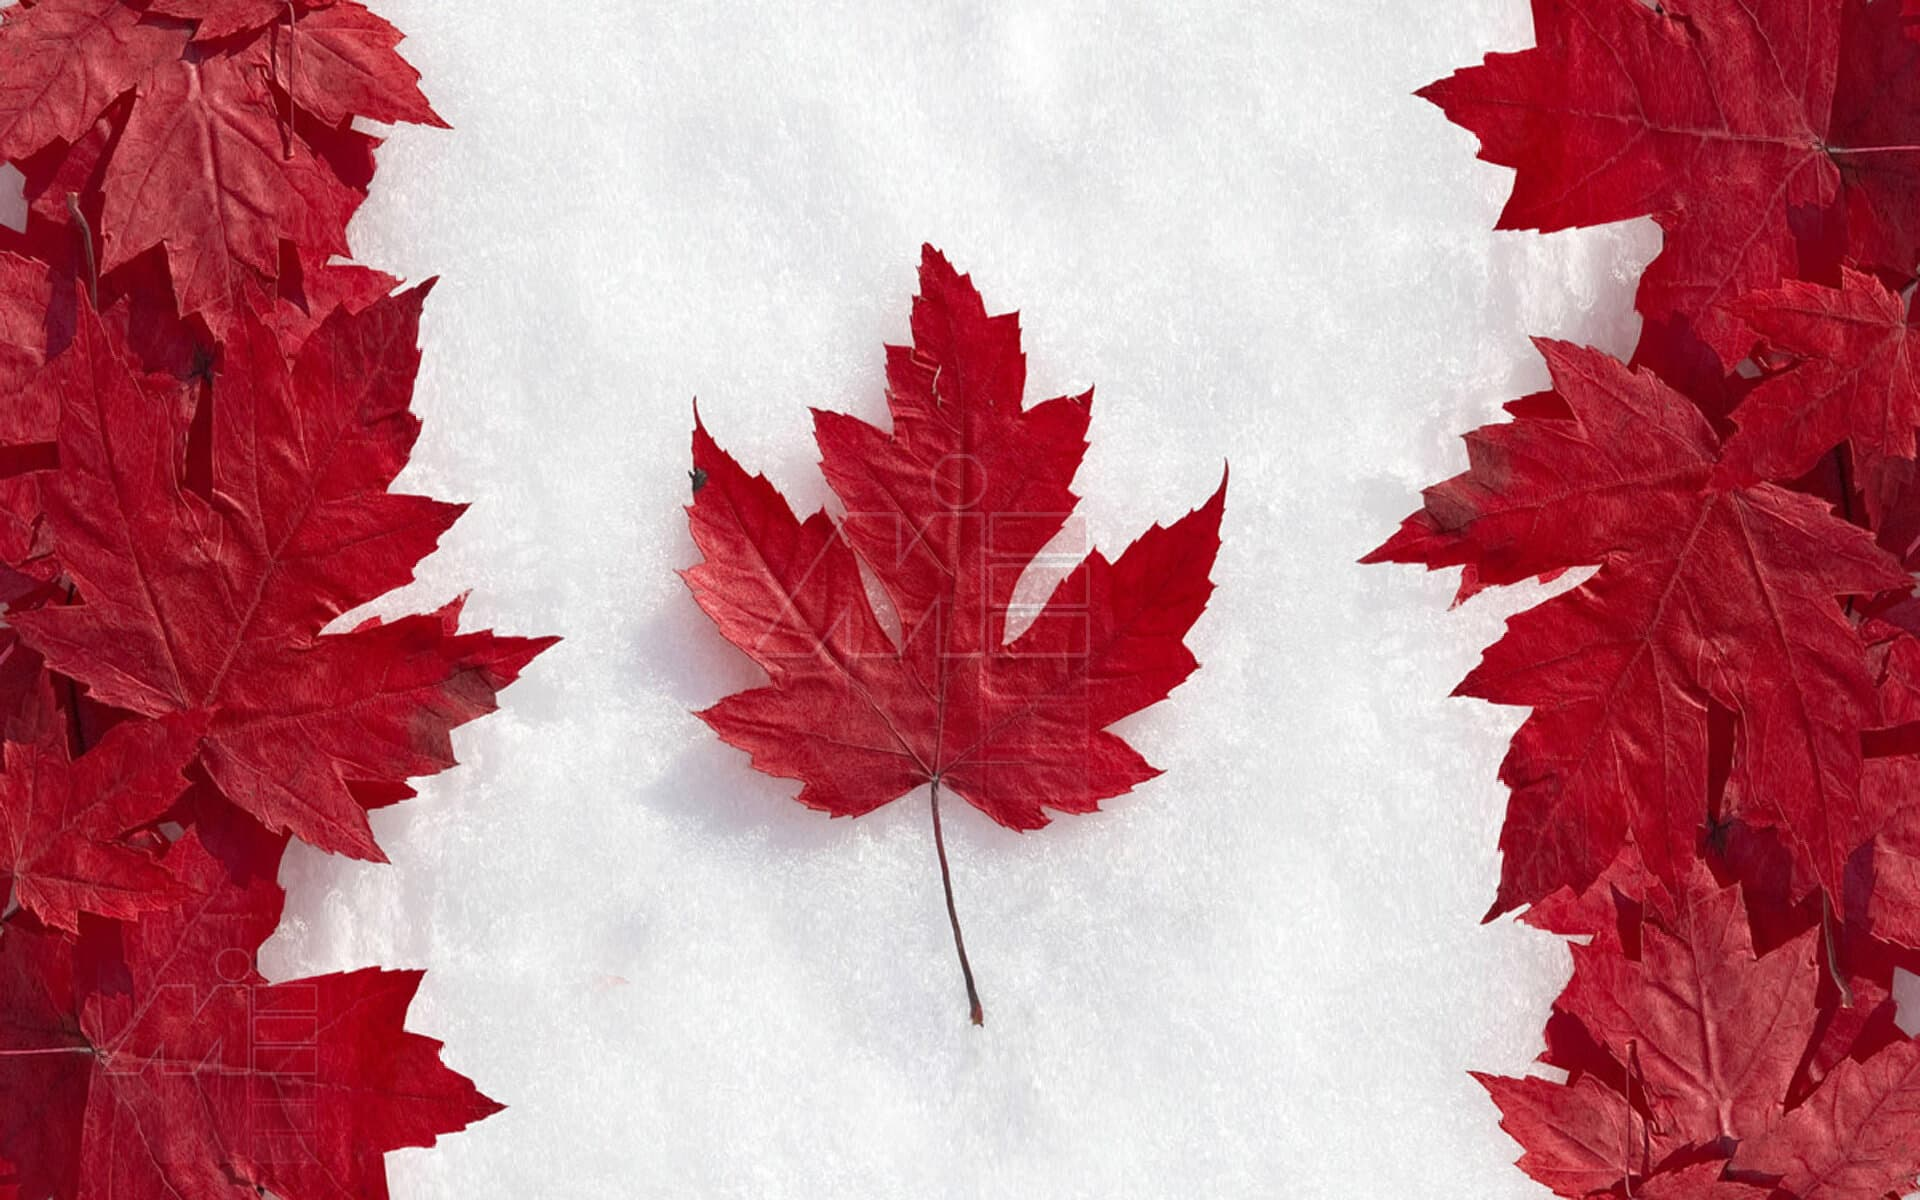 i2 wp com canada 1 اسکیل ورکر کانادا Skilled Worker